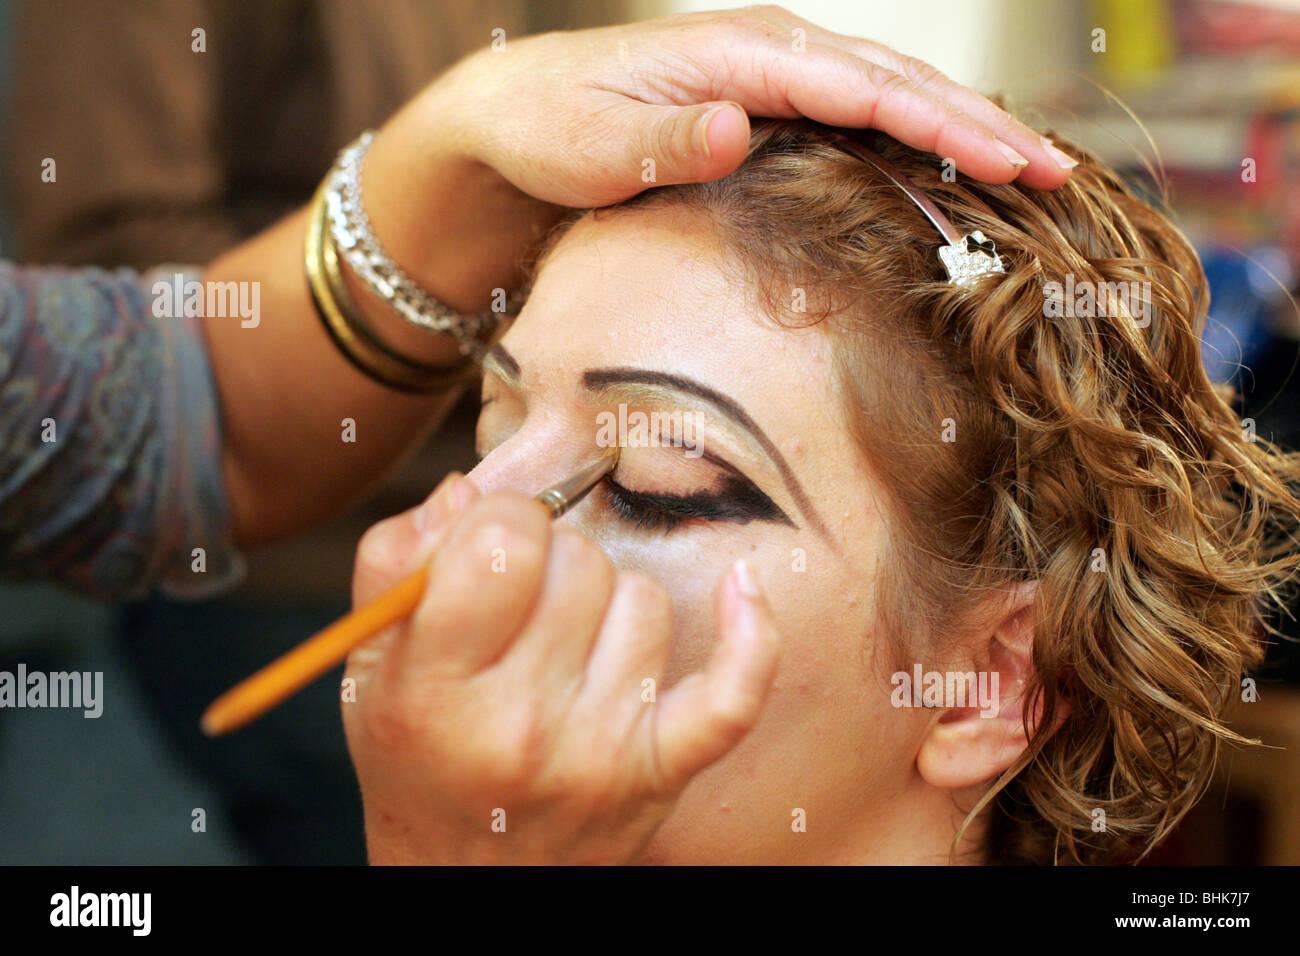 Makeup artist applying eyeliner to an actress. - Stock Image